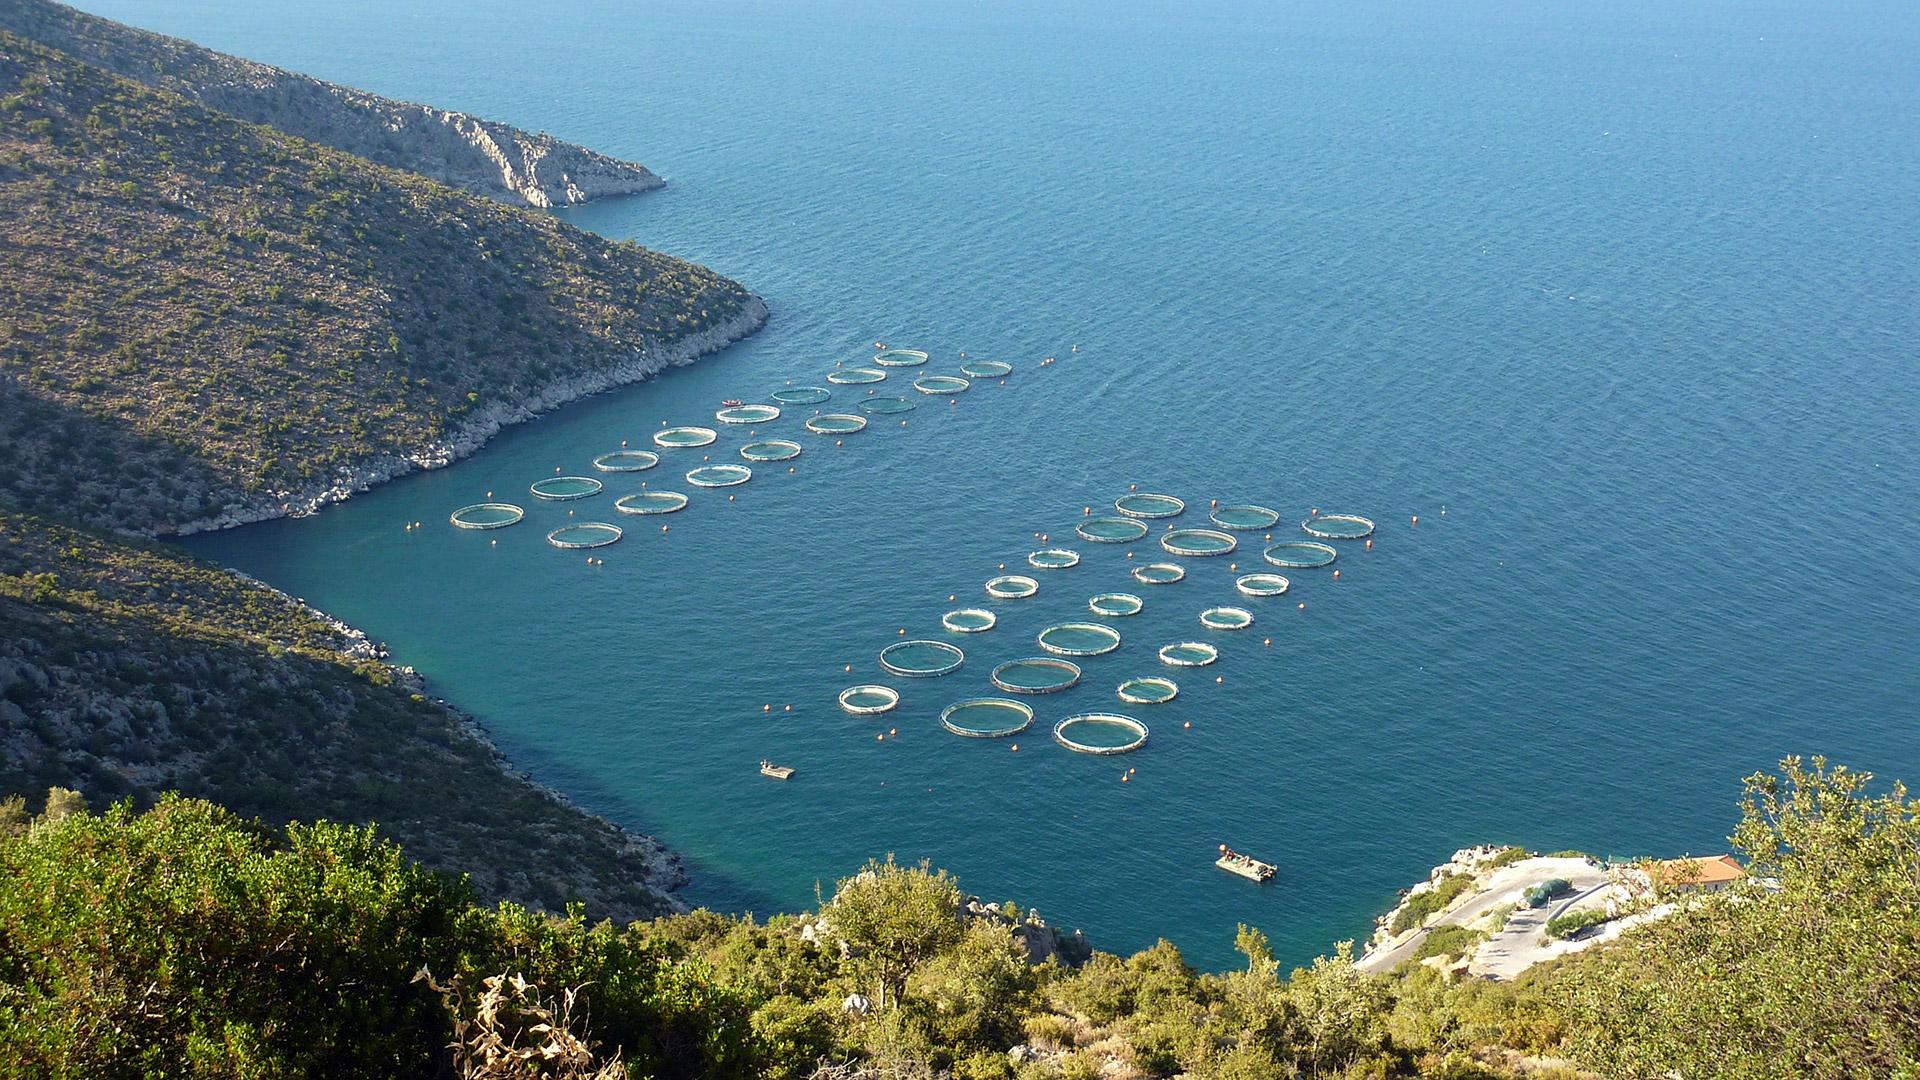 Fisch essen: Aquakultur im Mittelmeer